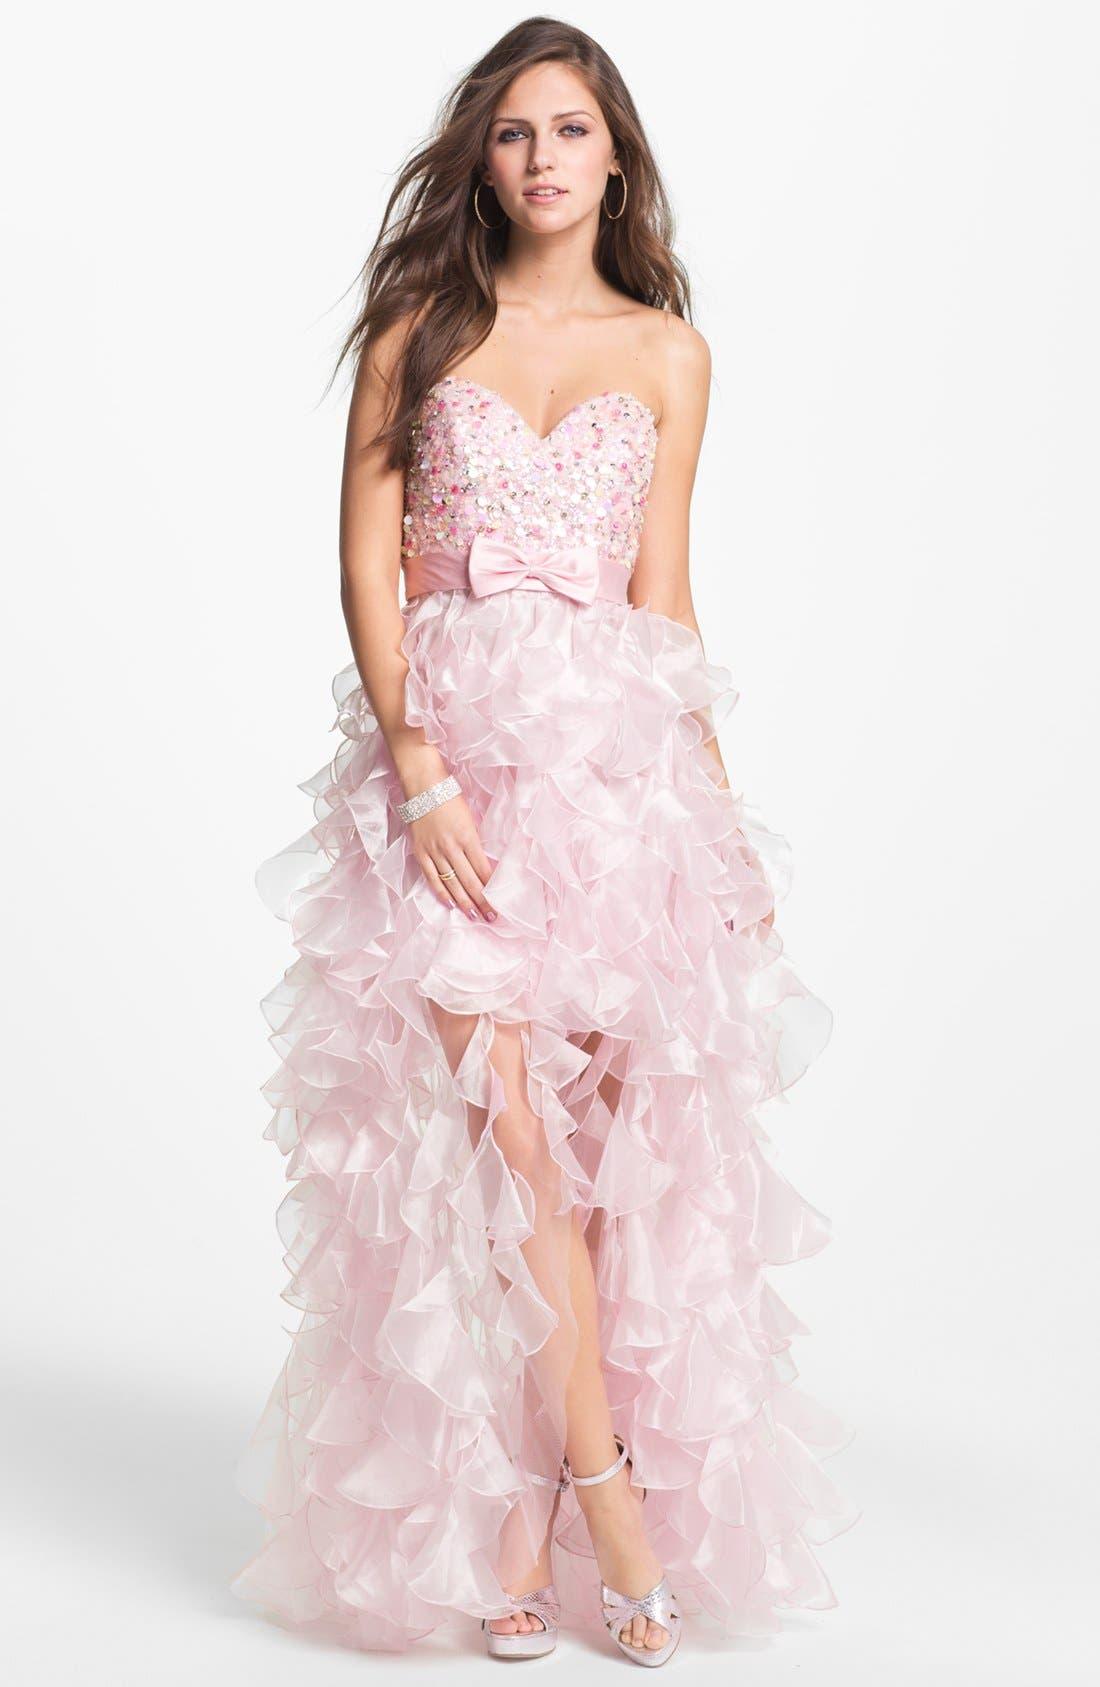 Alternate Image 1 Selected - Sherri Hill 'Corkscrew' Embellished Ruffled Chiffon Dress